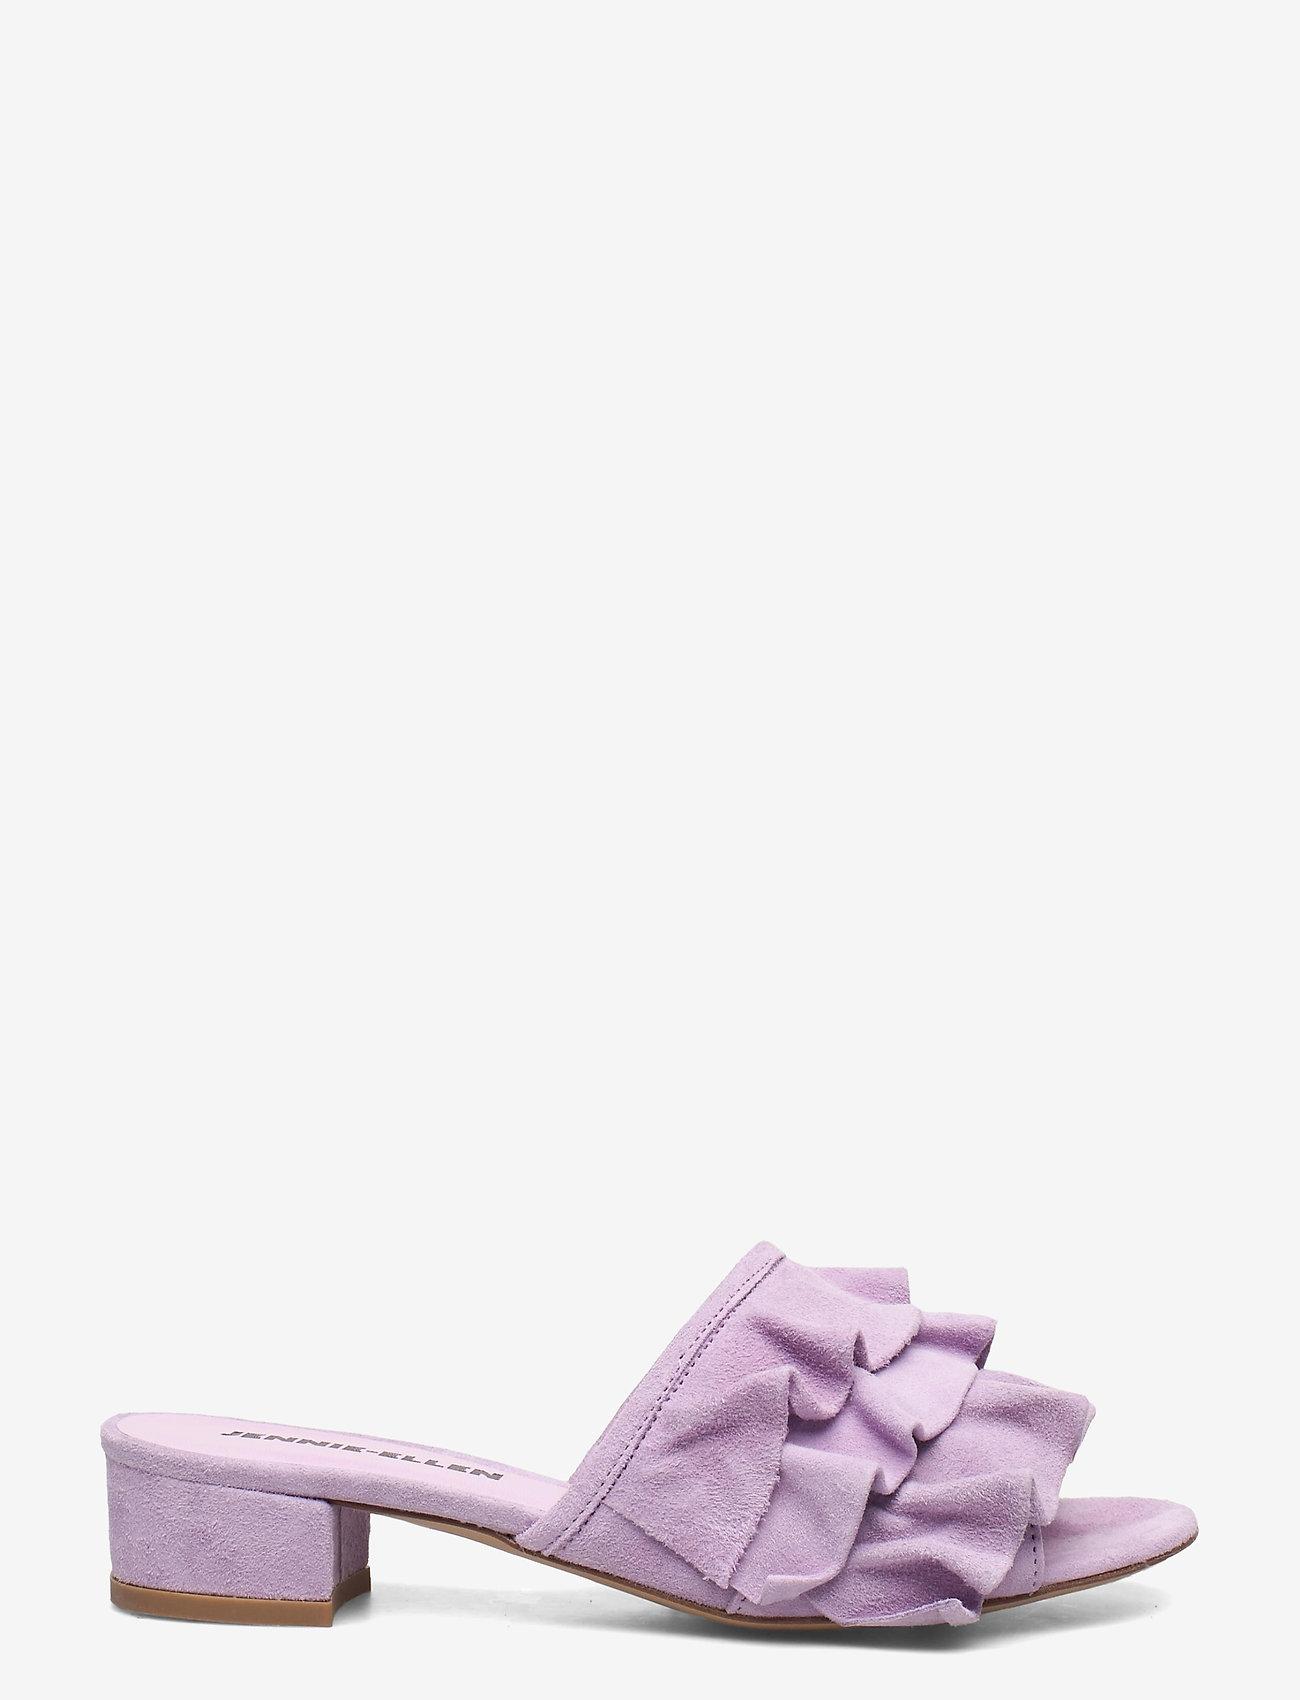 Jennie-Ellen - Maxi - mules & slipins - purple suede leather - 0